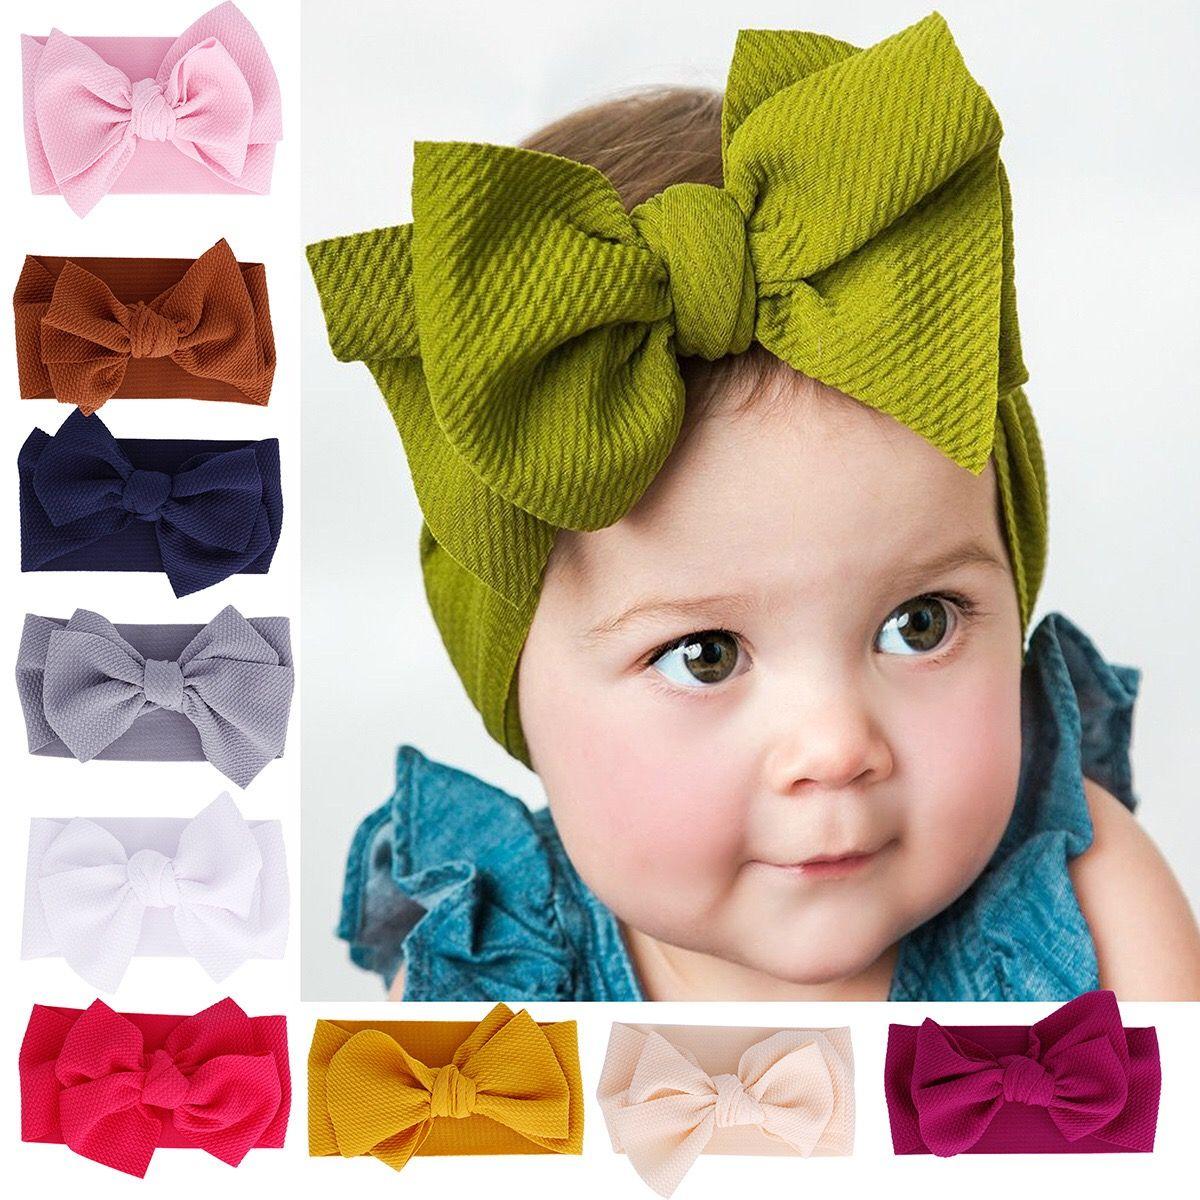 Baby Girls Kids Toddler Sweet Bow Knot Hairband Headband Stretch Cloth Head Wrap